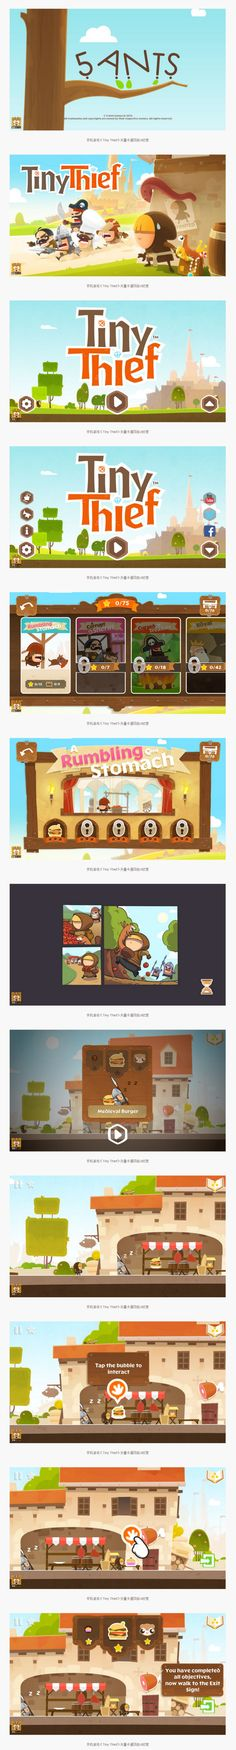 "Mobile game ""Tiny Thief"" Vector cartoon ..."